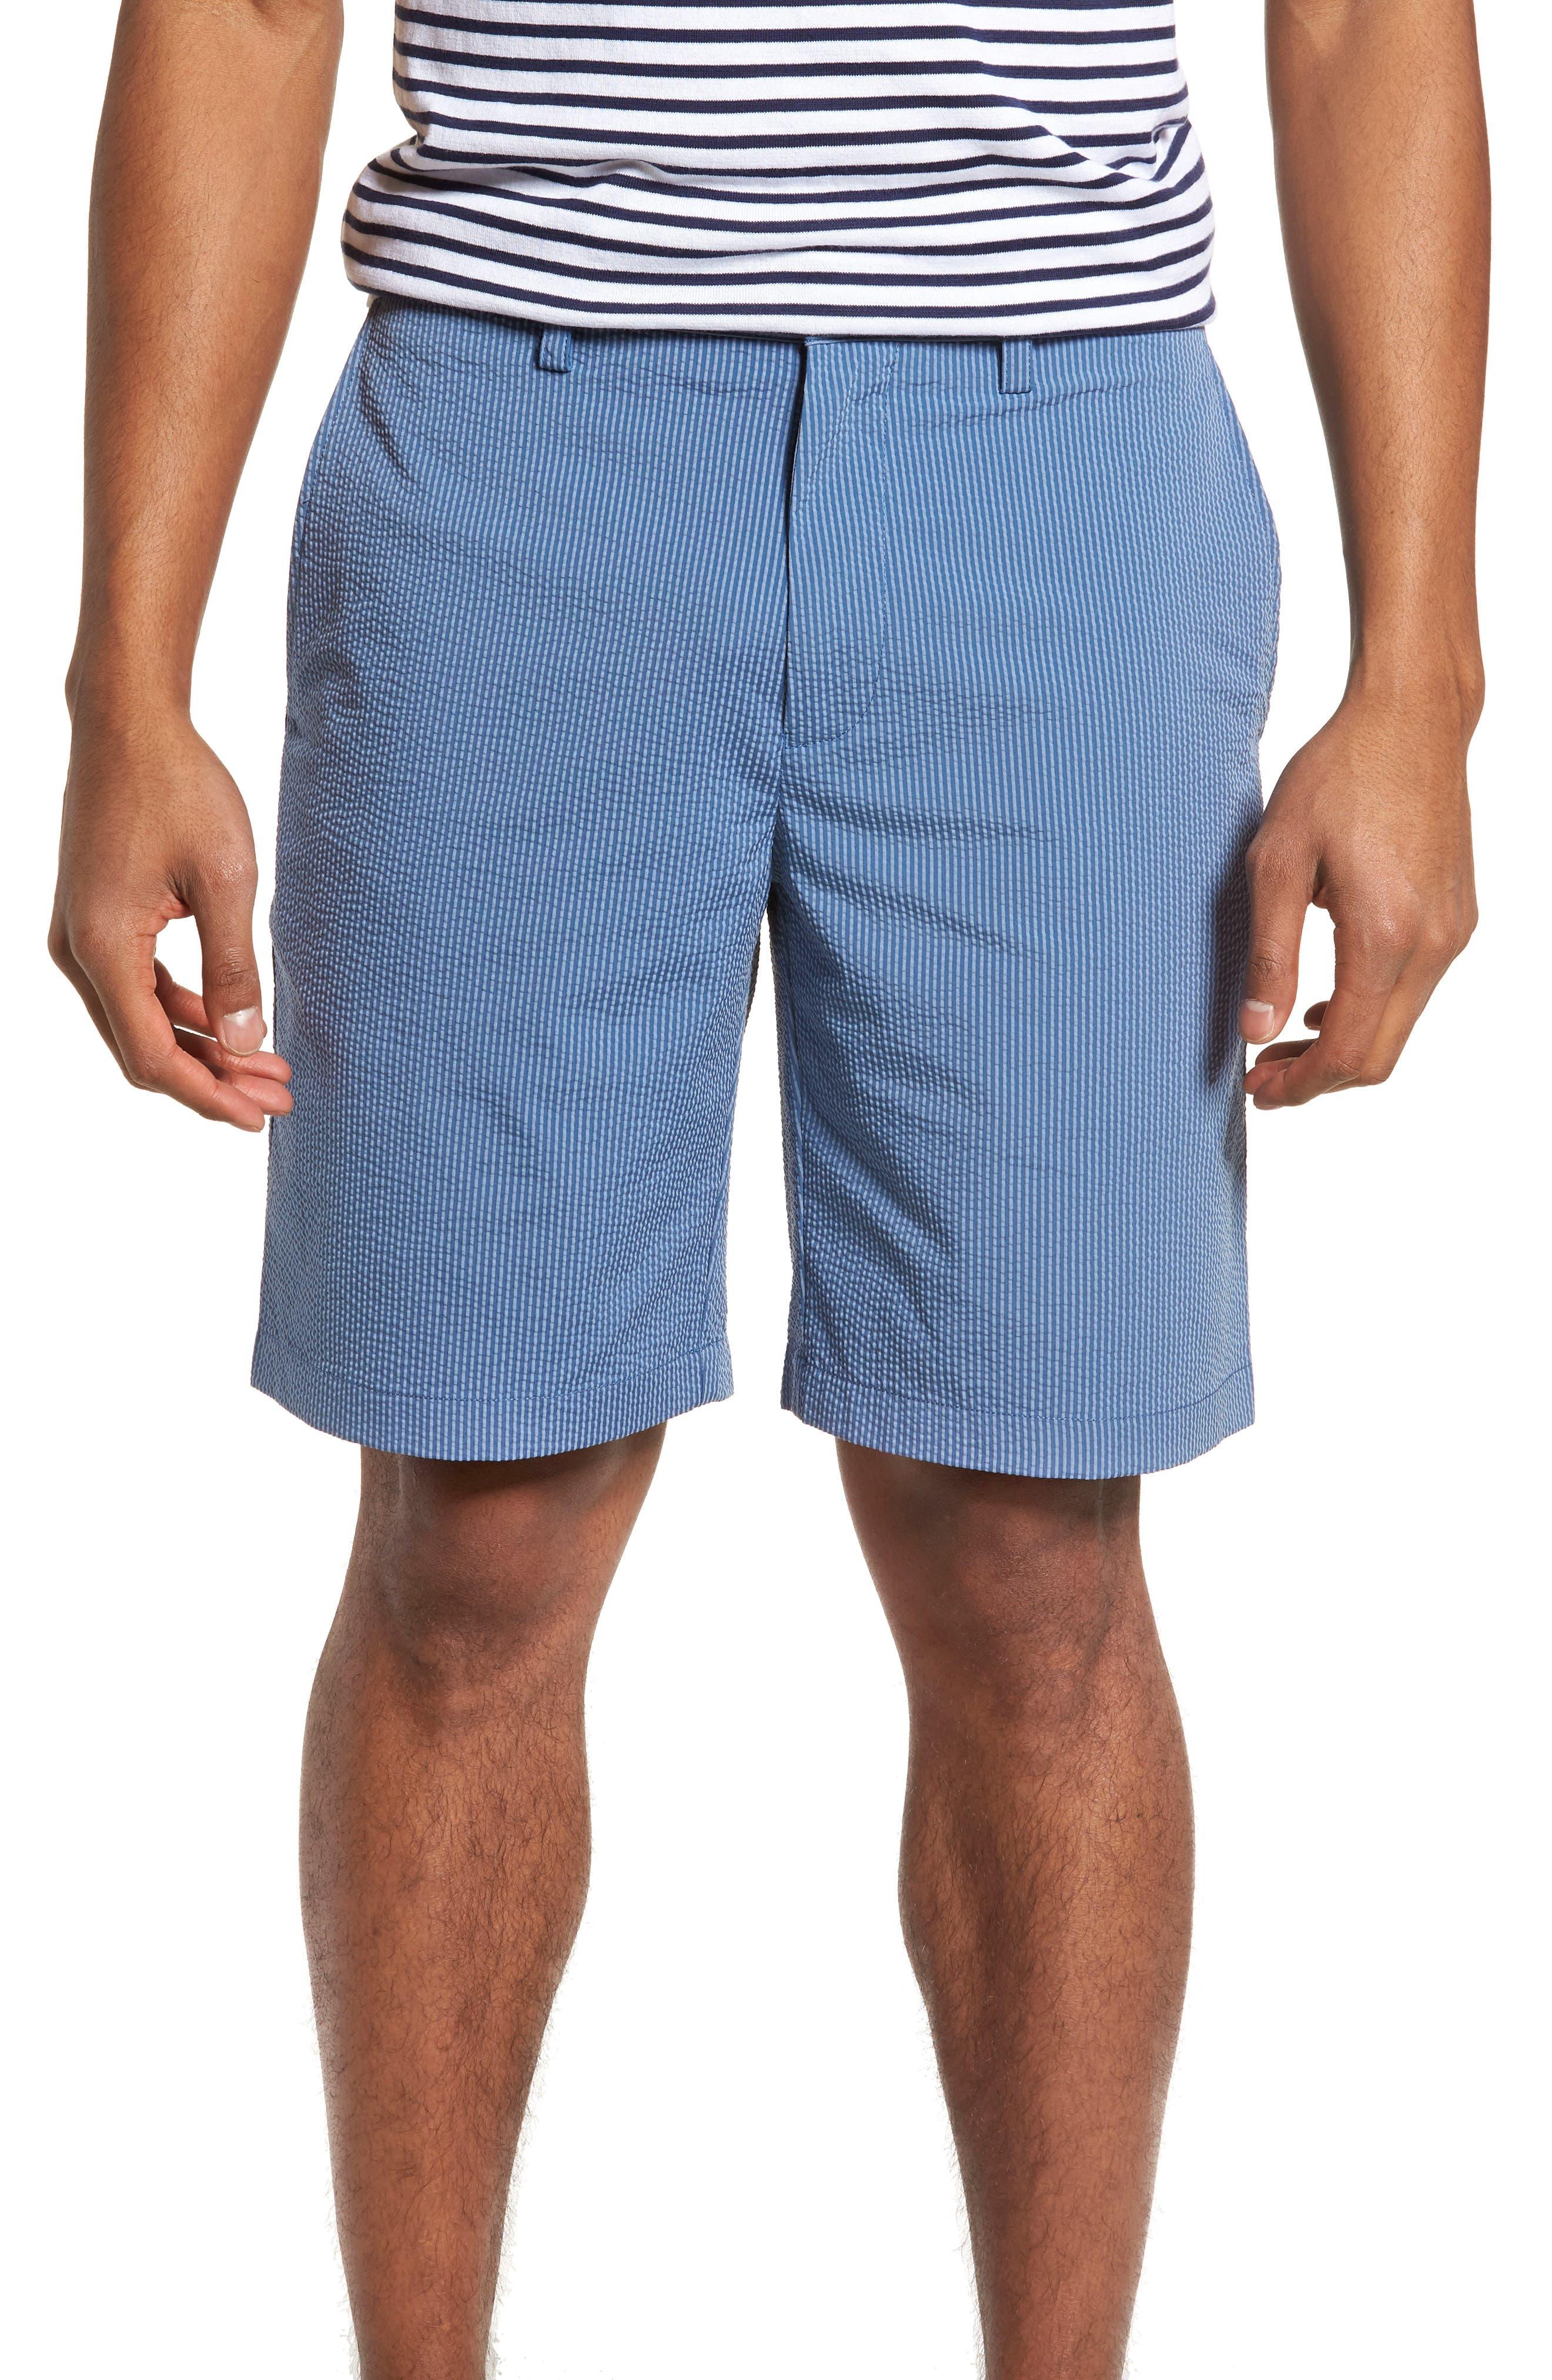 Seersucker Shorts,                             Main thumbnail 1, color,                             425